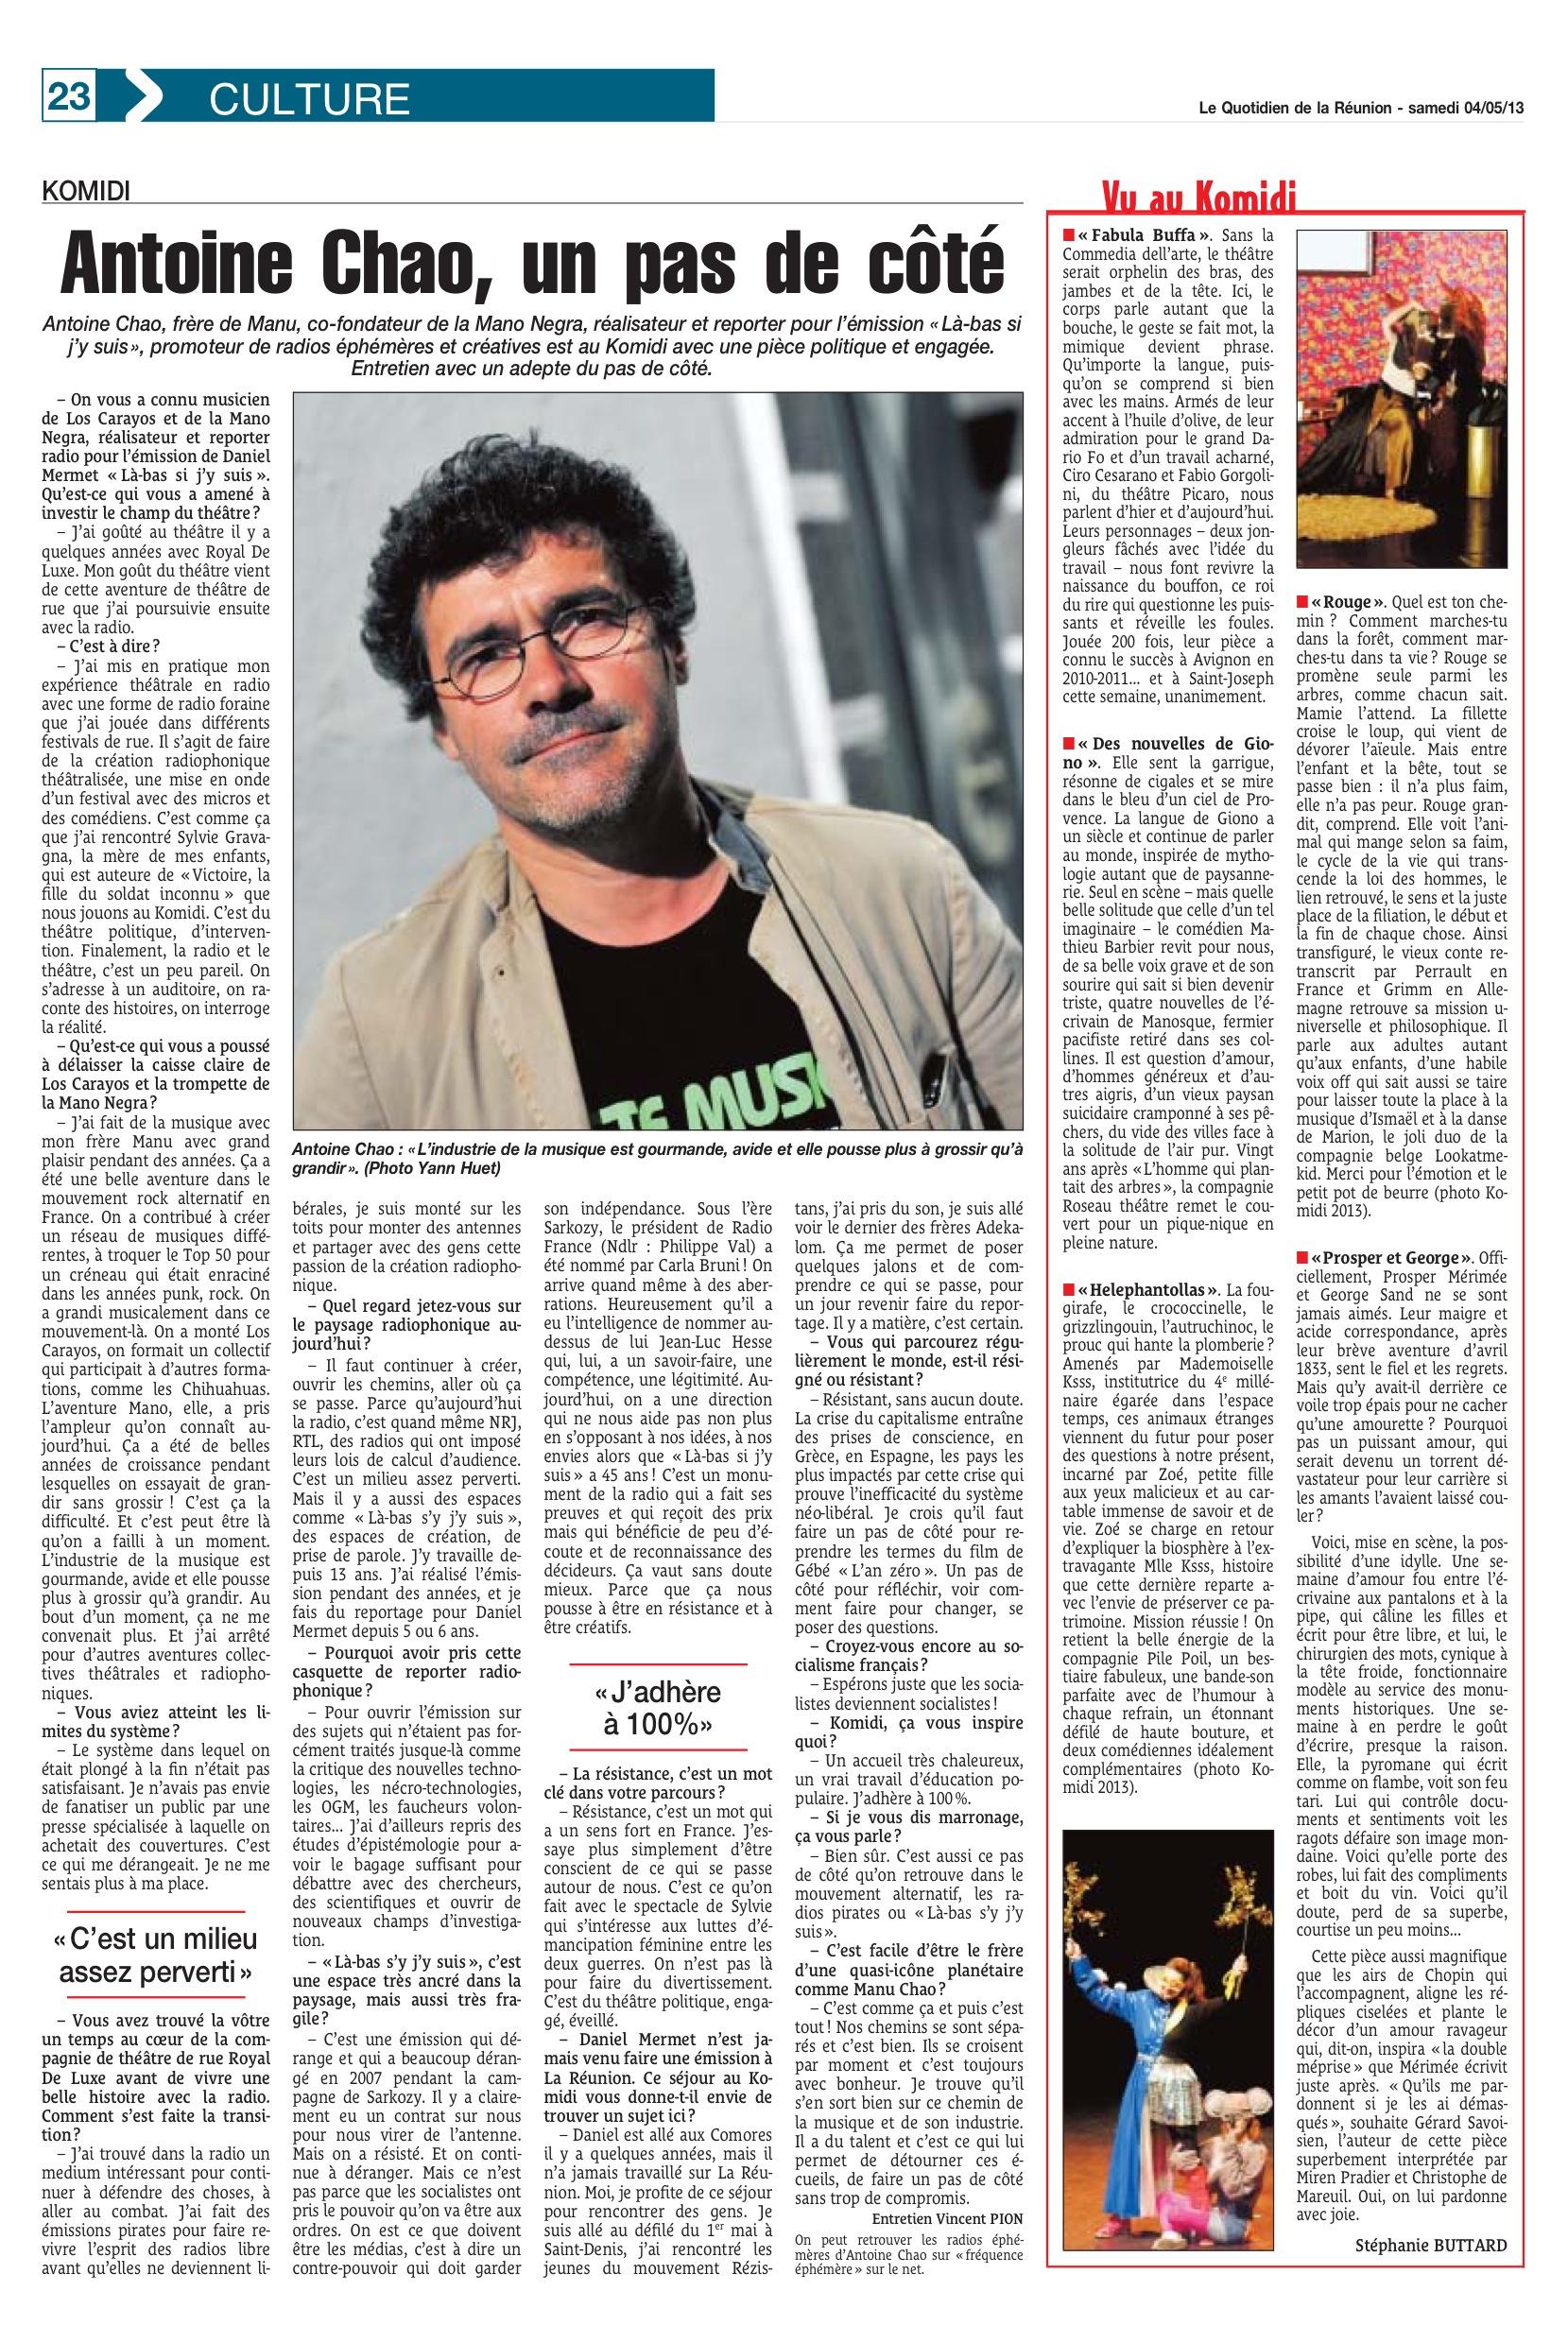 Presse-Quotidien-04052013